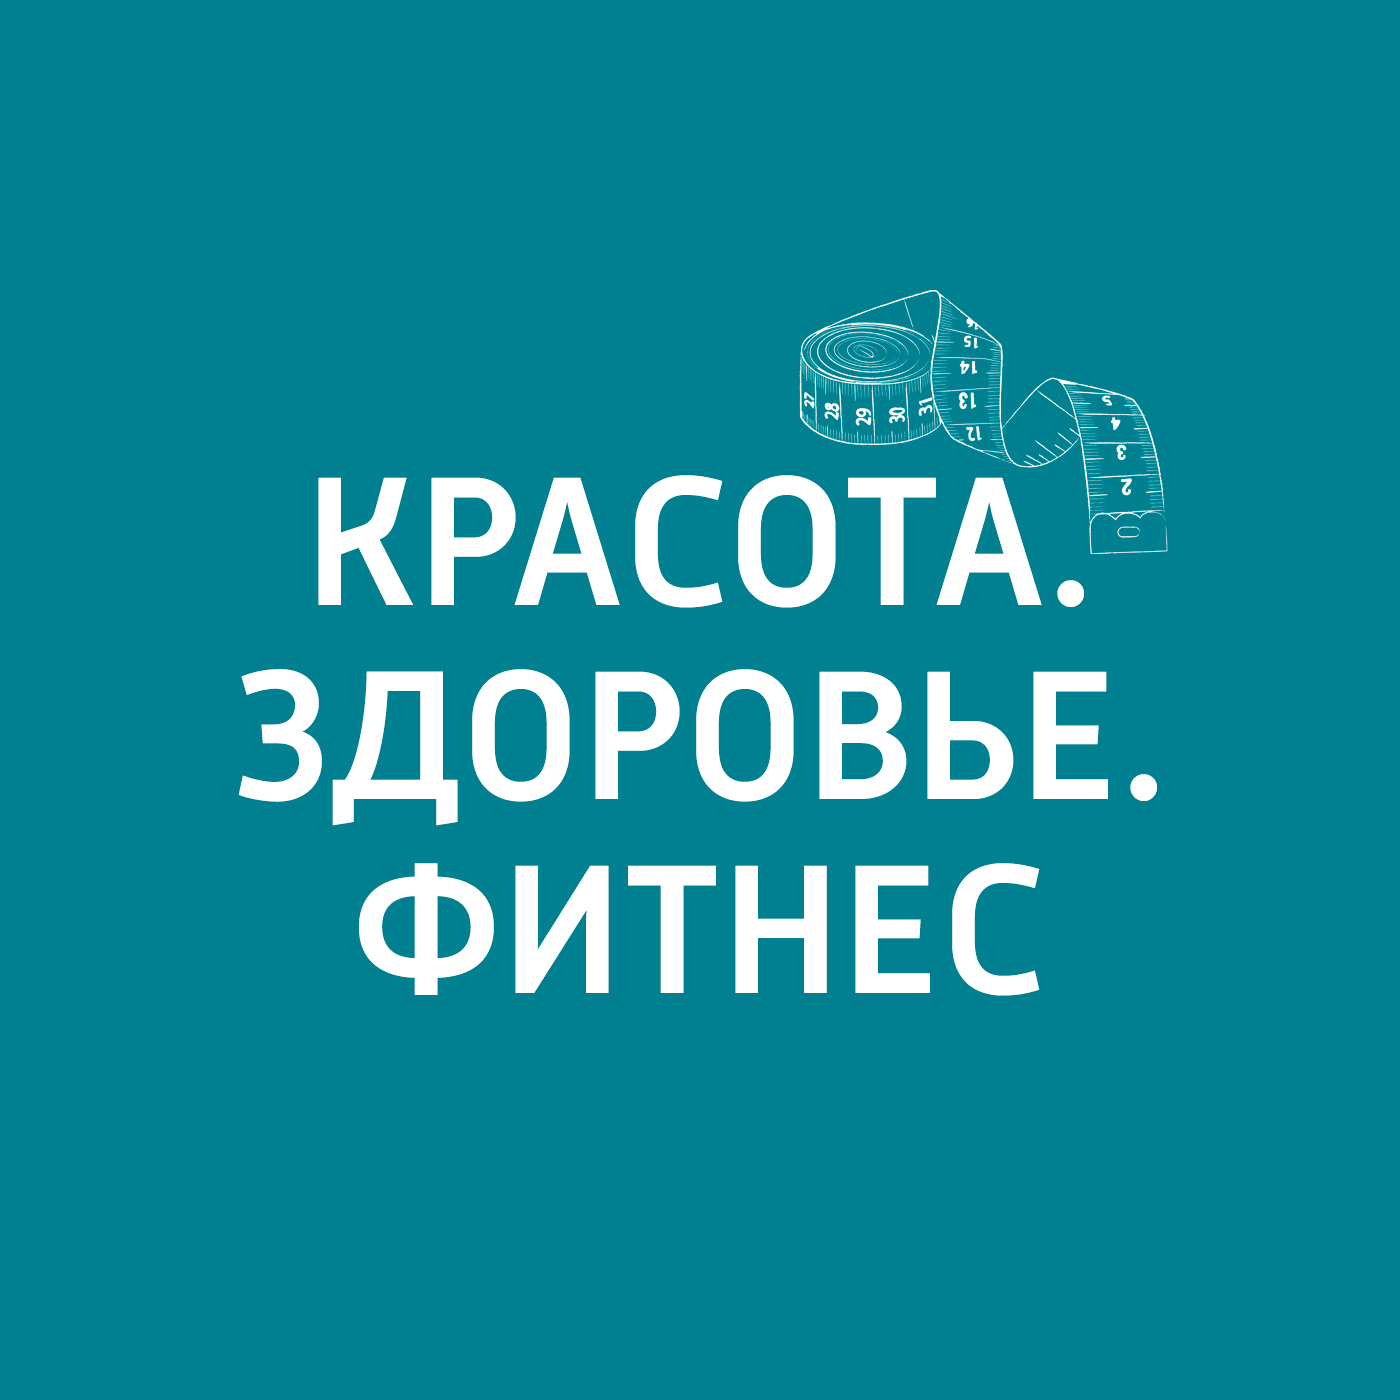 Маргарита Митрофанова Новогоднее меню маргарита митрофанова ольга дыховичная